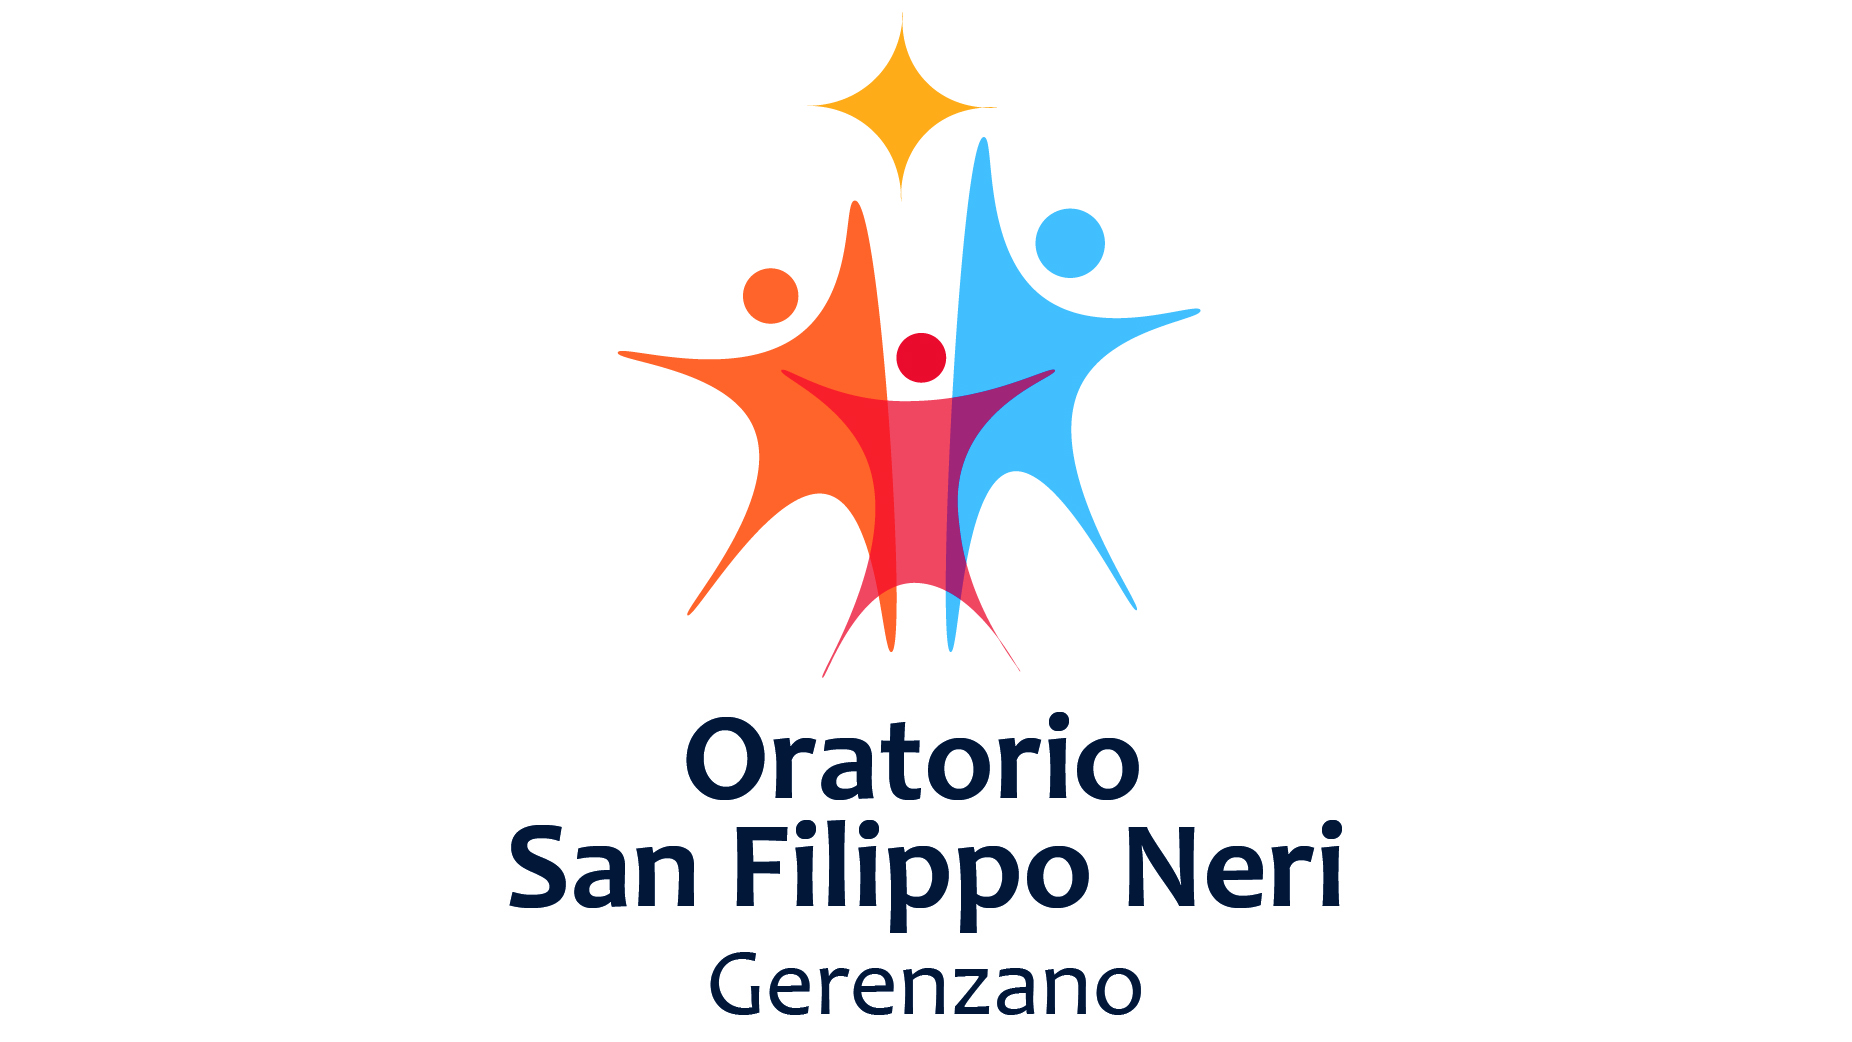 Nuovo logo oratorio san filippo neri gerenzano